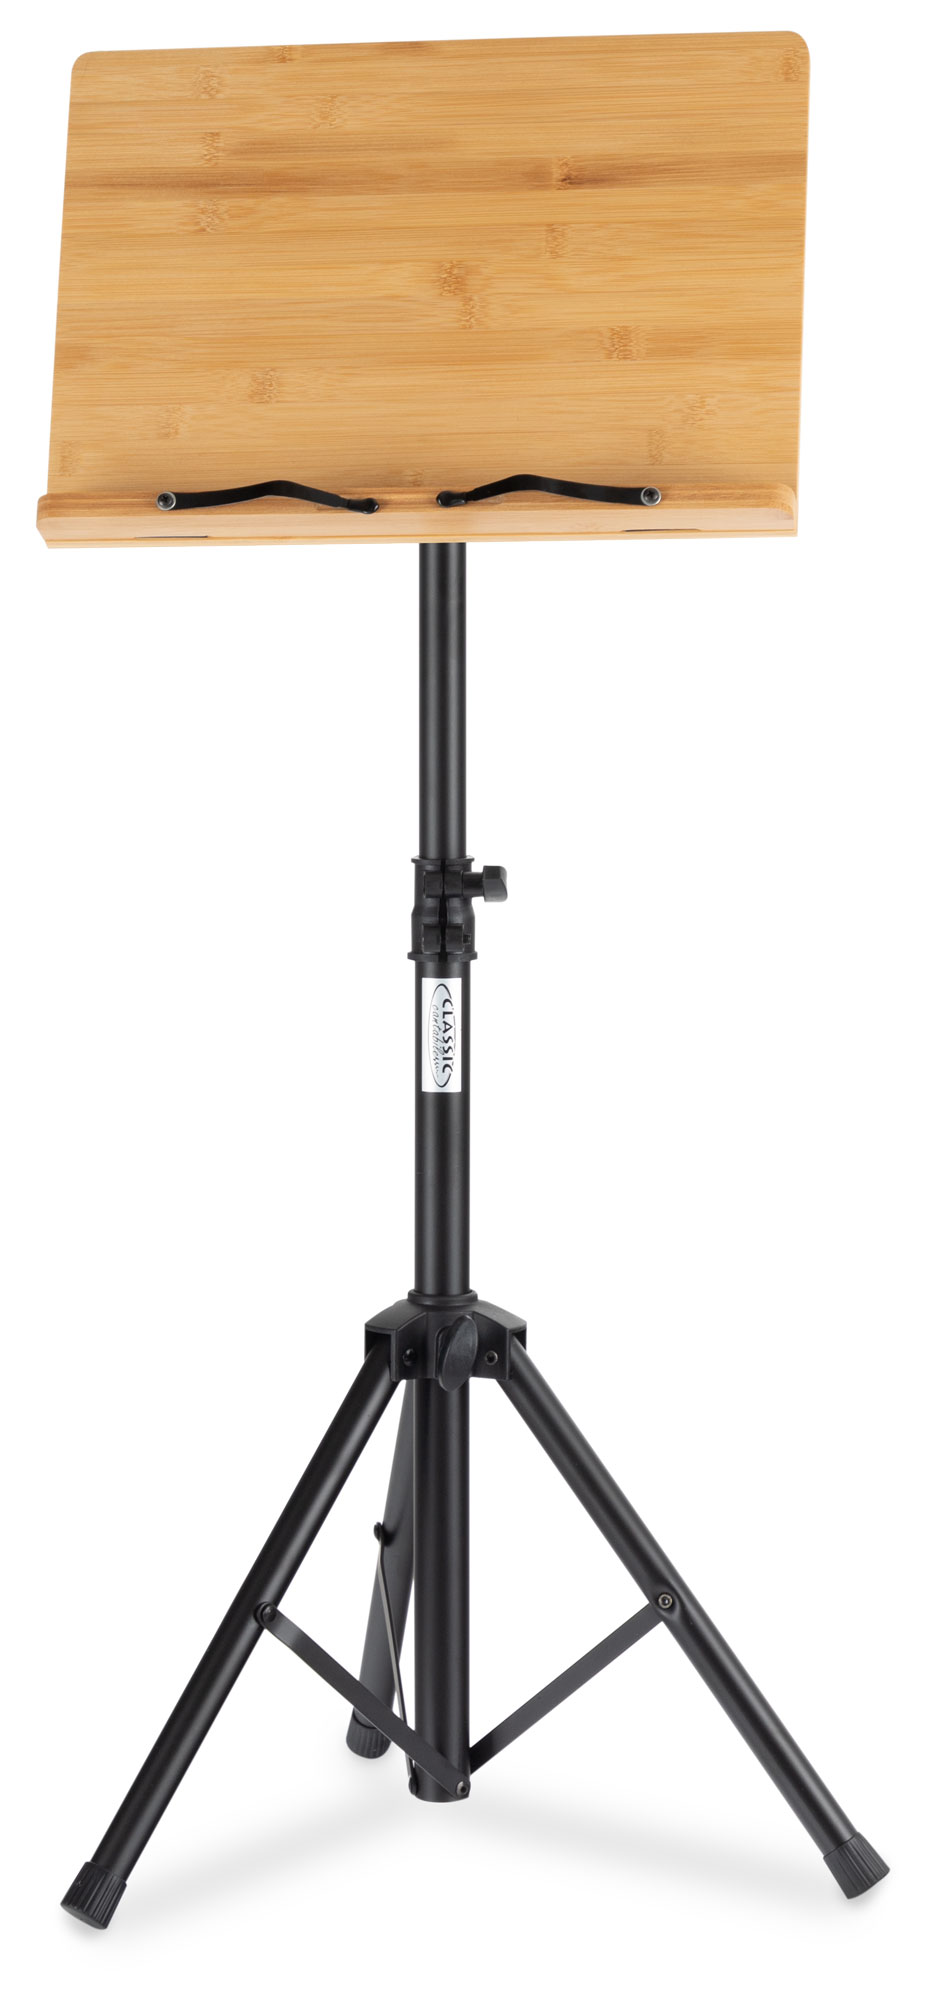 Musikerzubehoer - Classic Cantabile OSW 125 Notenpult Bambus - Onlineshop Musikhaus Kirstein